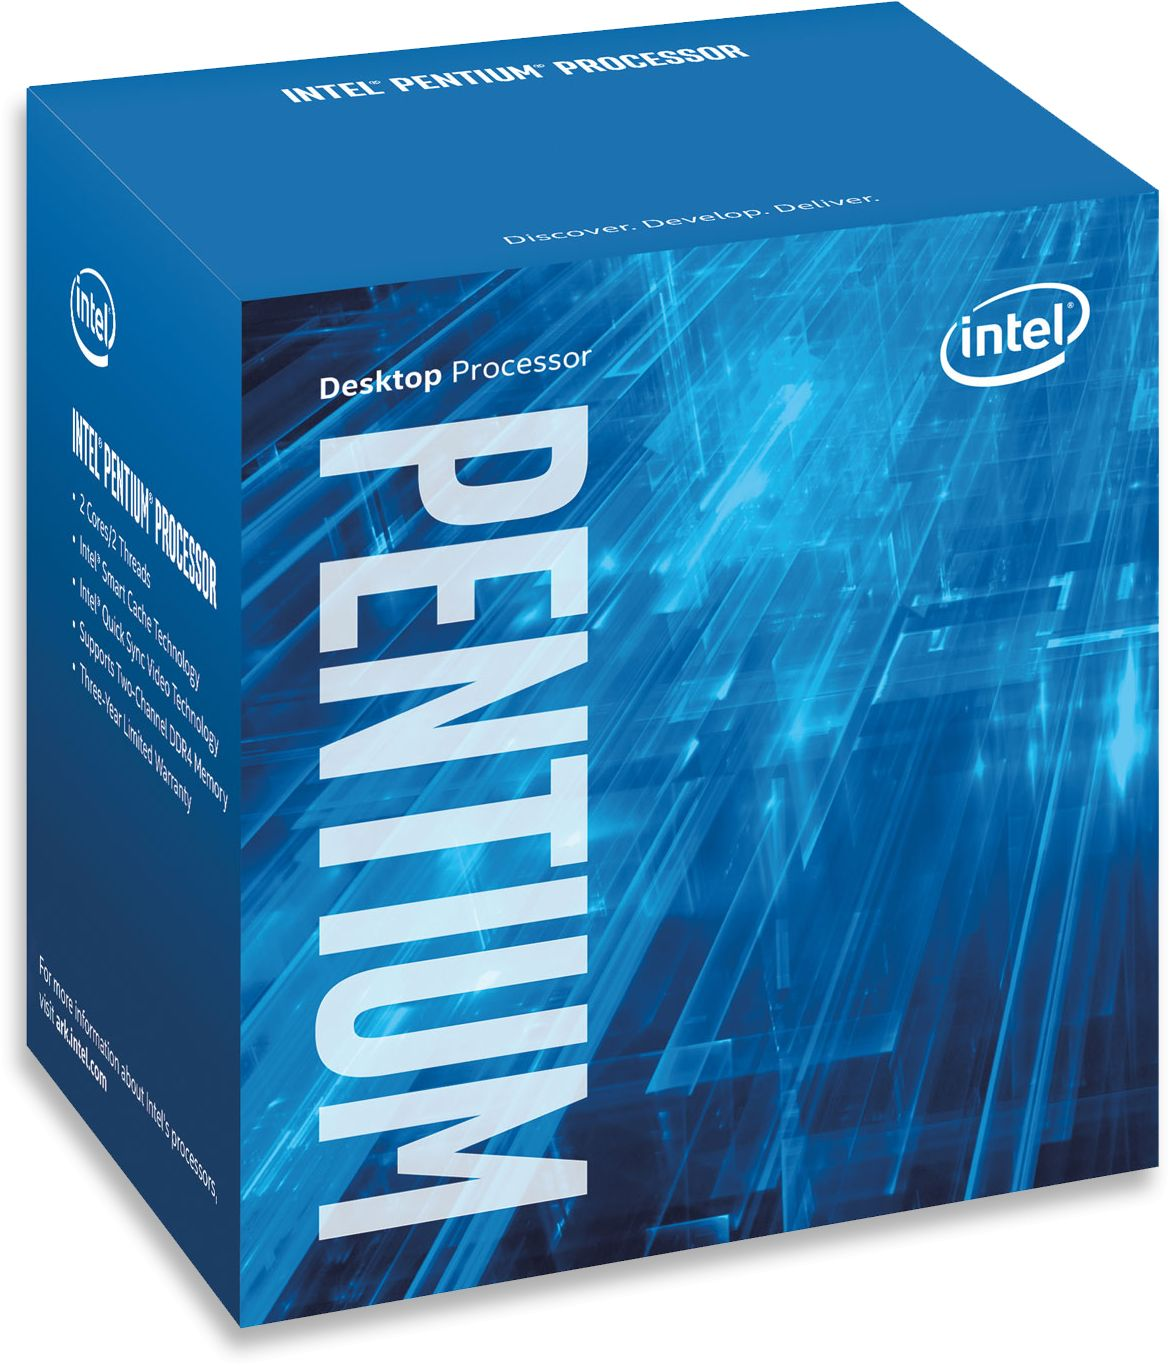 Intel Kaby Lake 7th Generation Pentium Processors